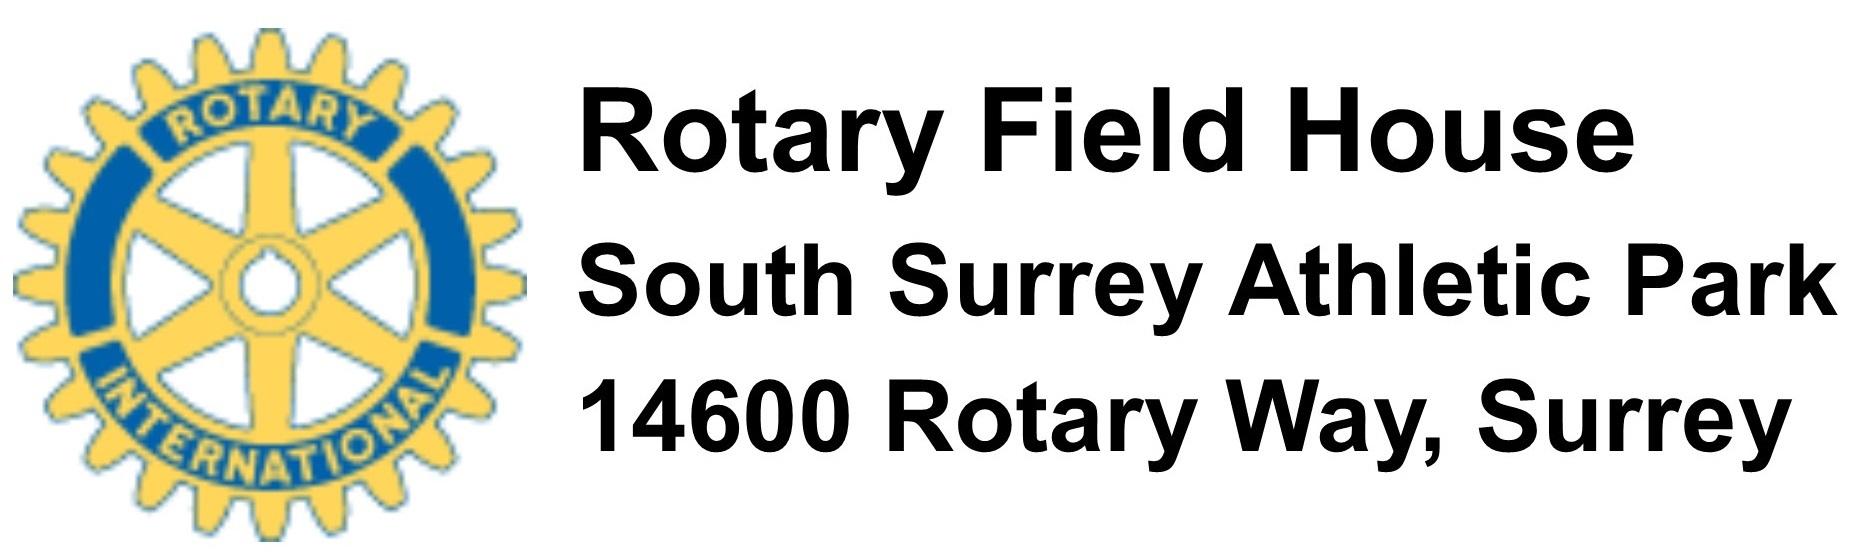 Rotary Field House